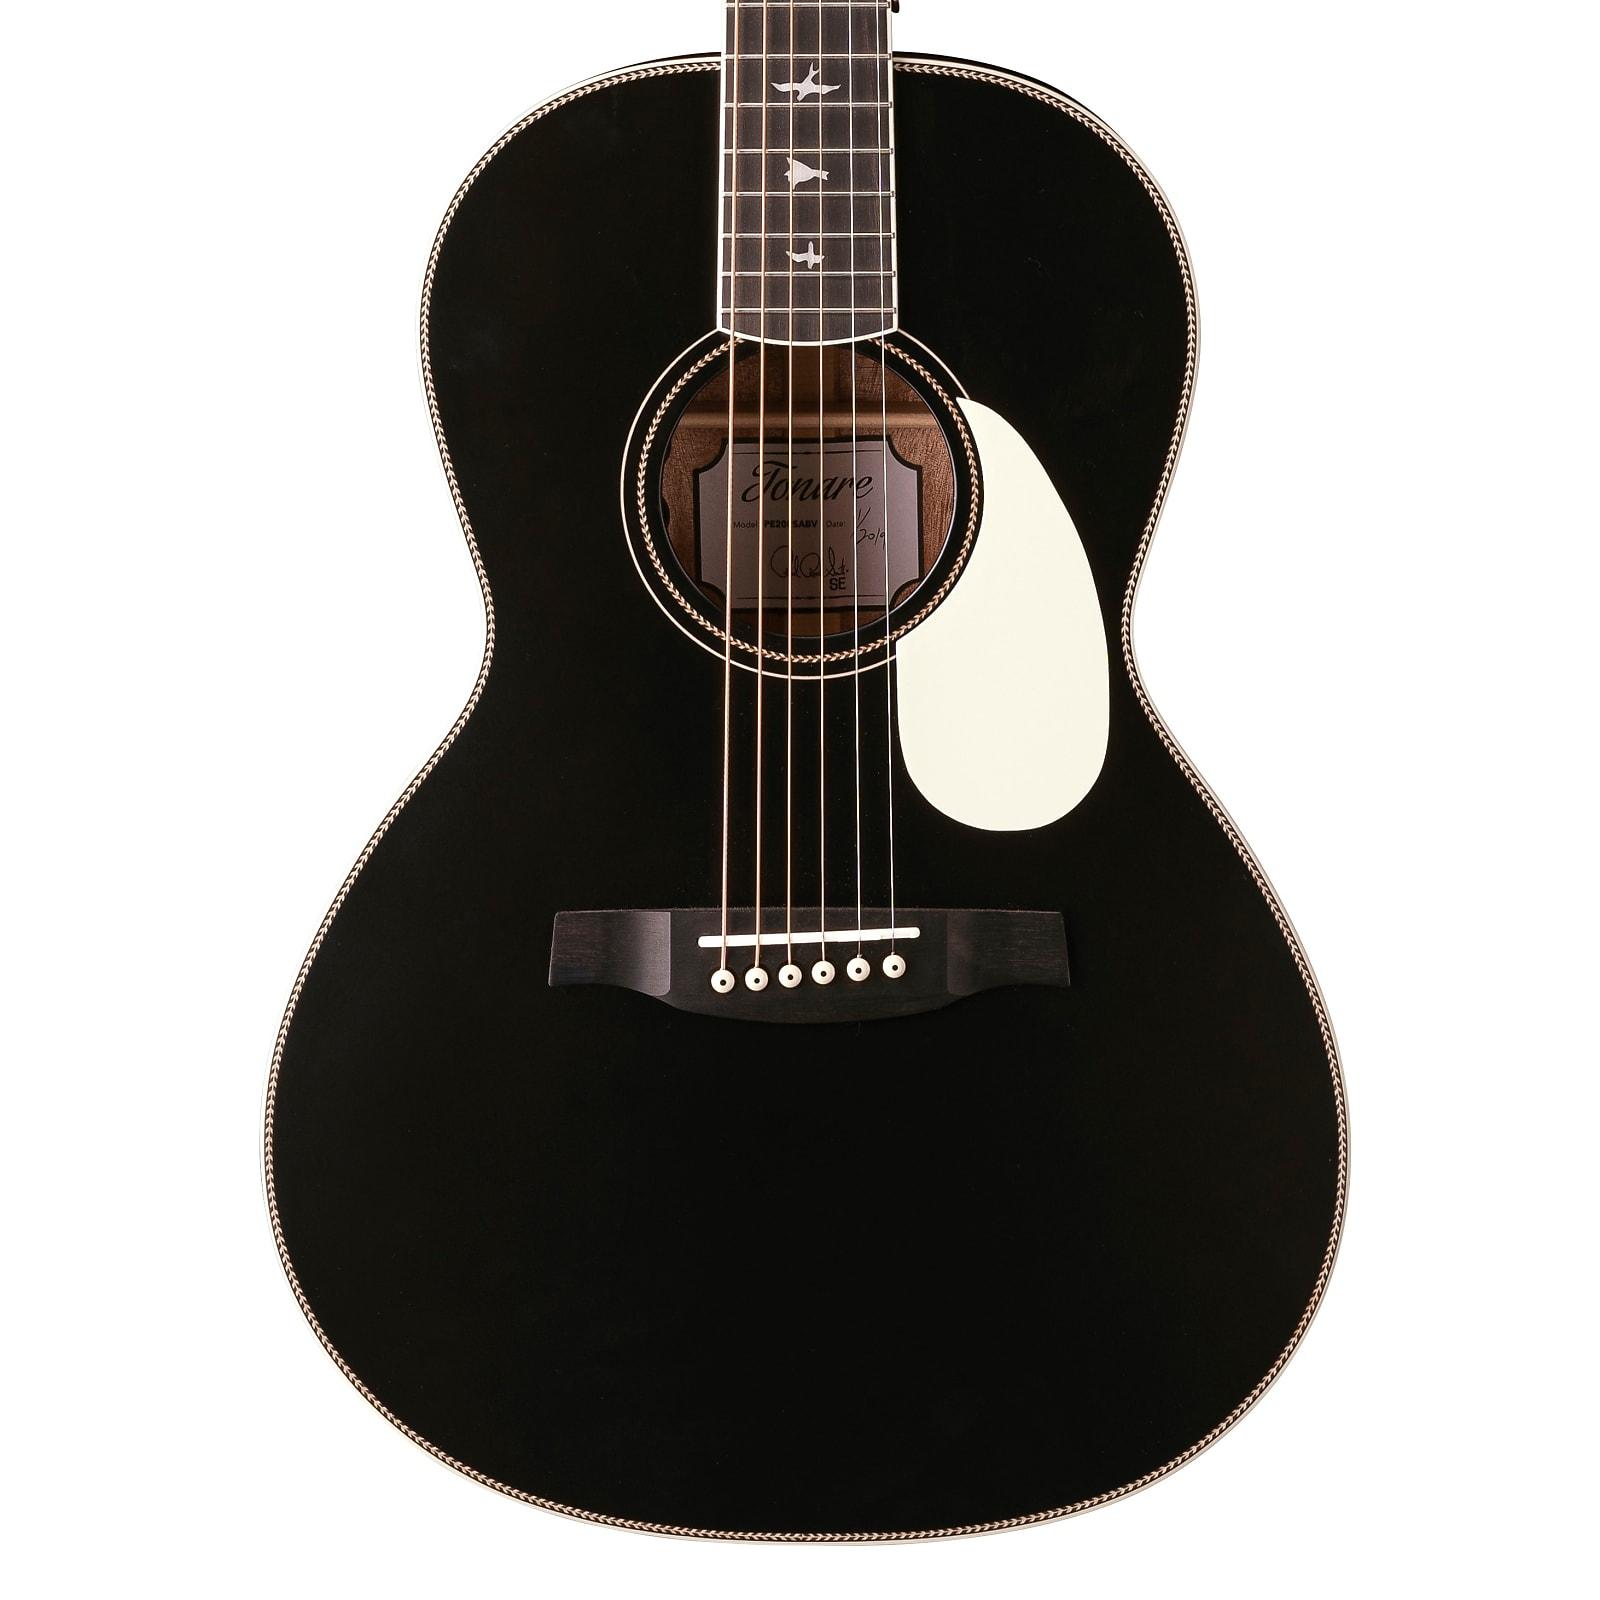 Paul Reed Smith PRS SE P20E Tonare Parlor Acoustic Electric Guitar Satin Black